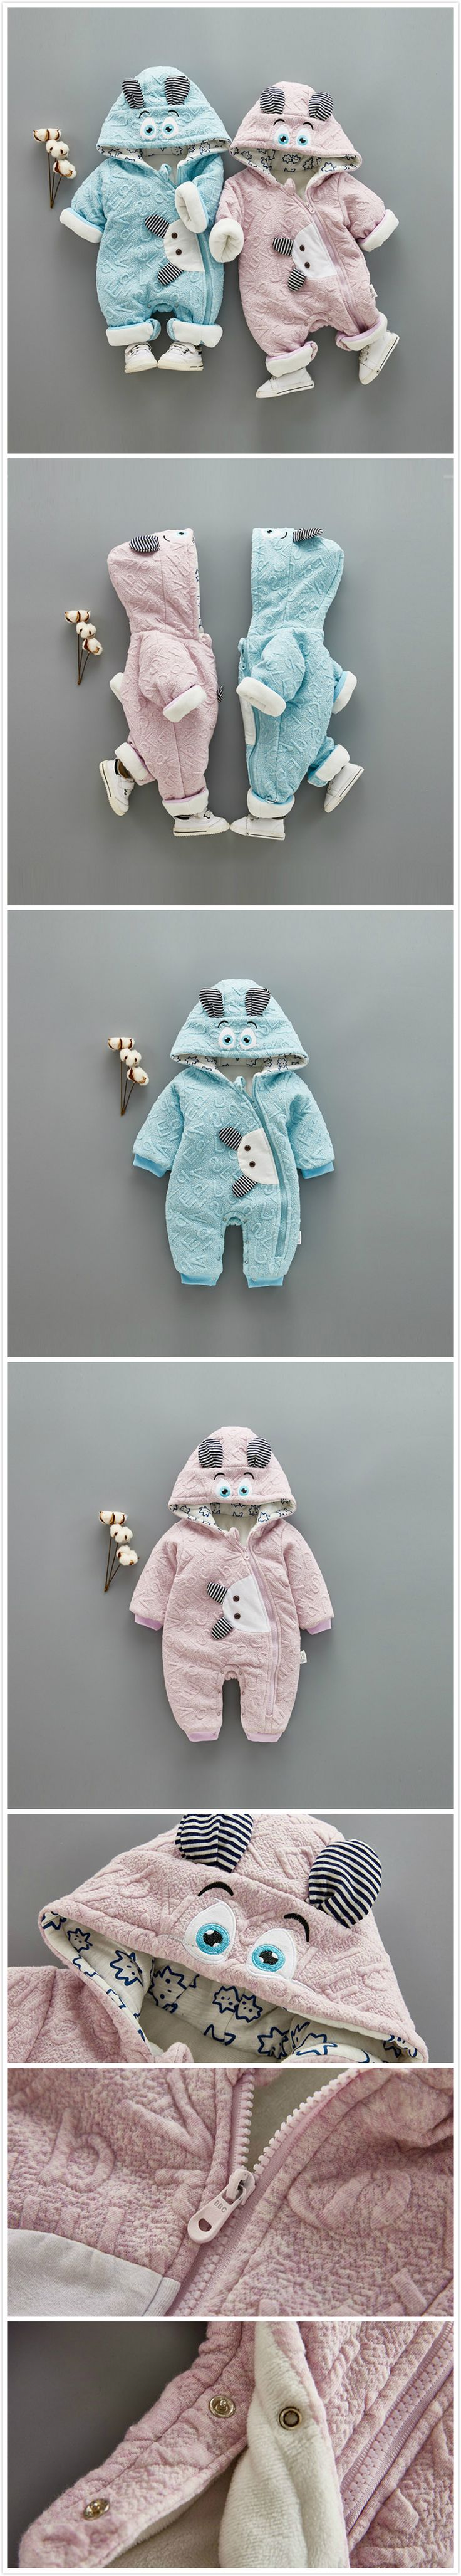 2-Color Cartoon Baby Unisex Hooded Winter Warm Jumpsuit https://presentbaby.com